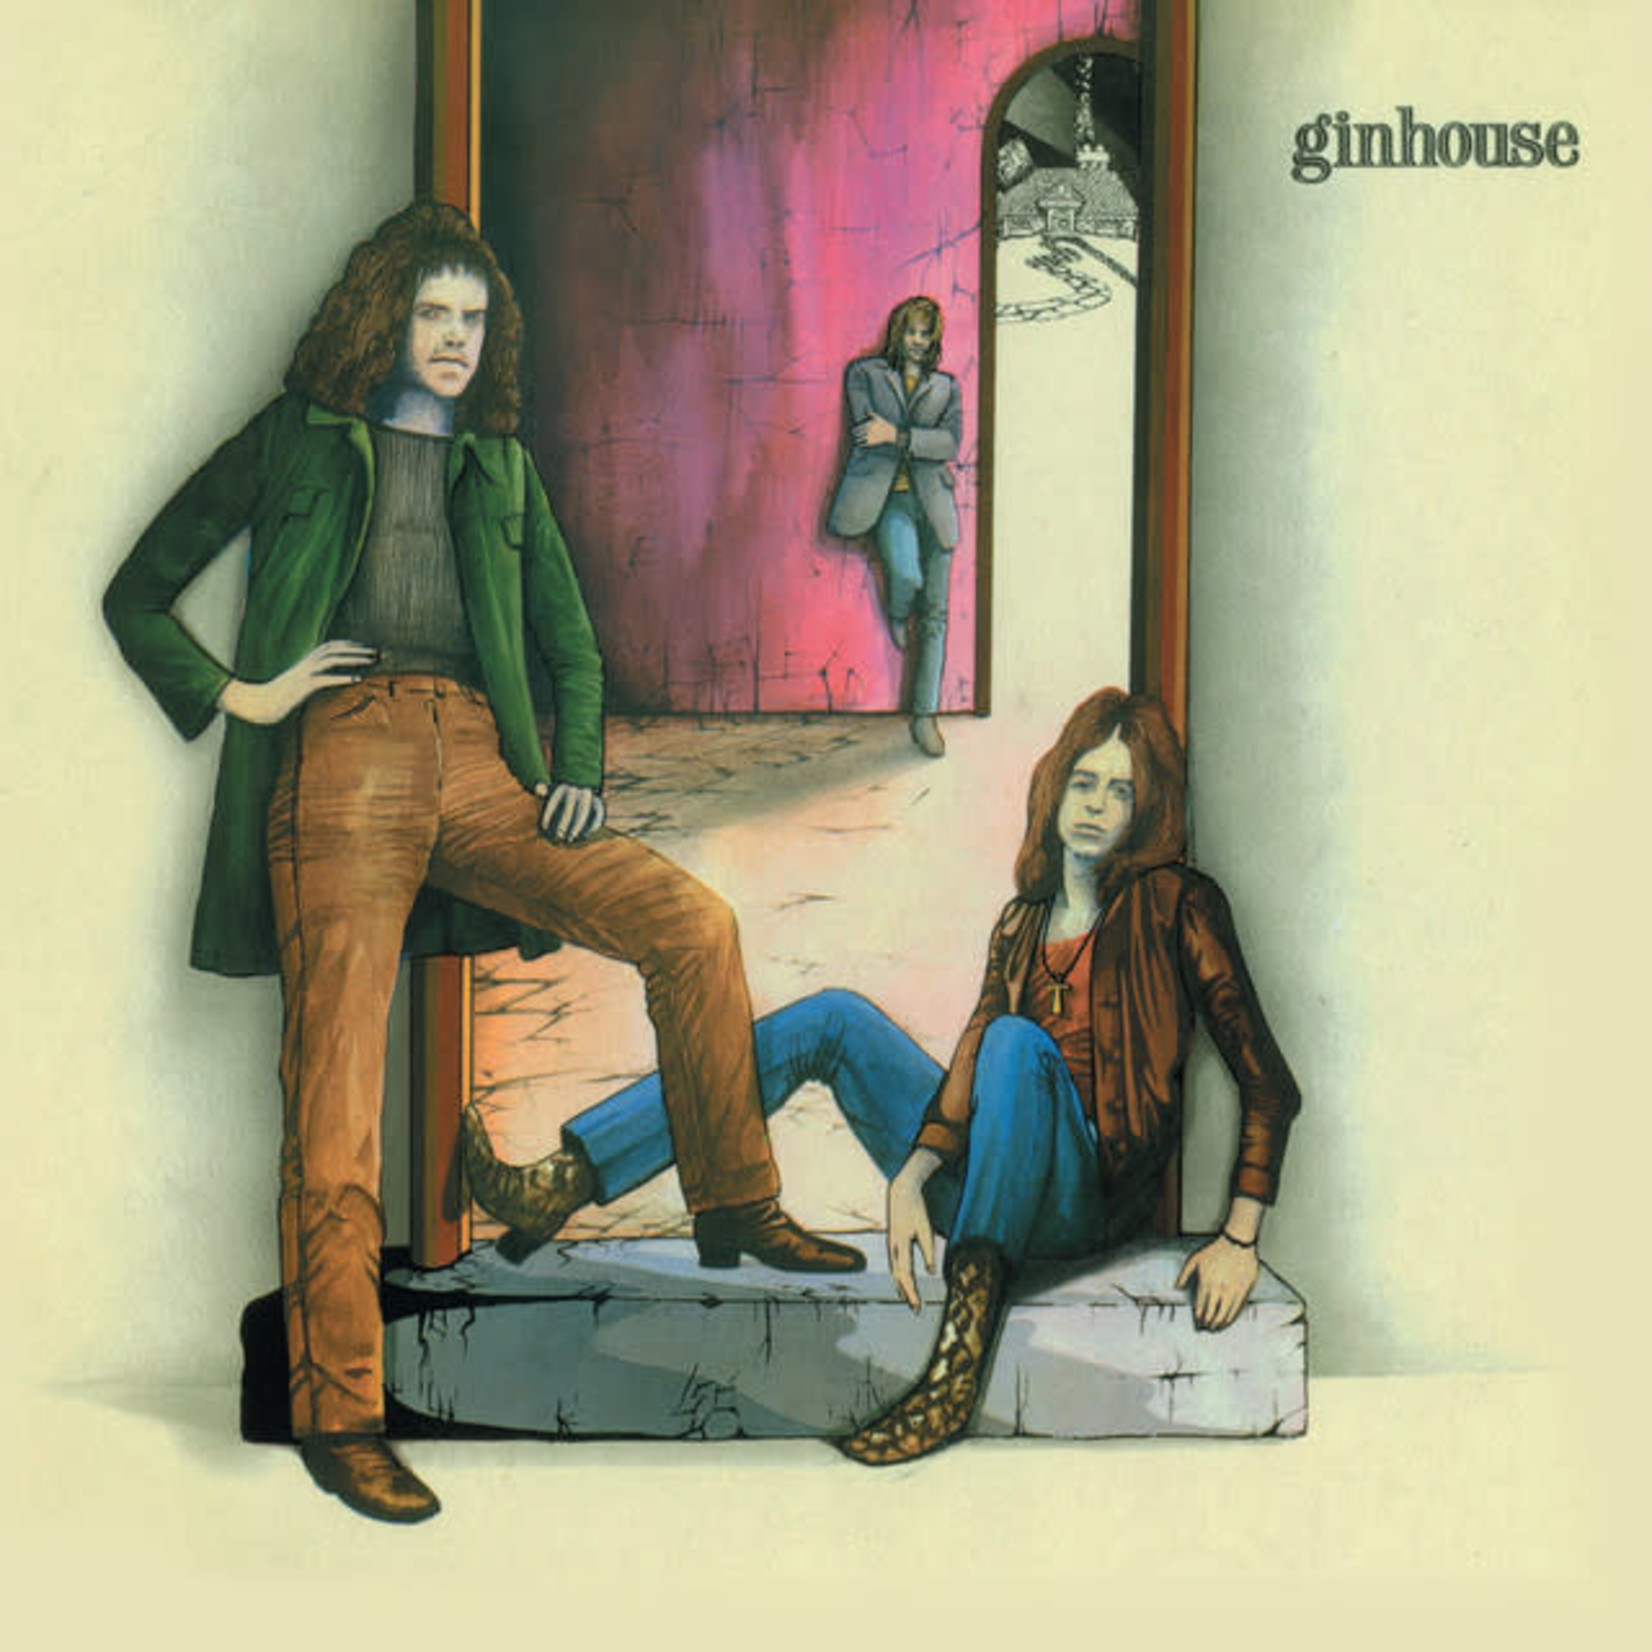 Vinyl Ginhouse - ST